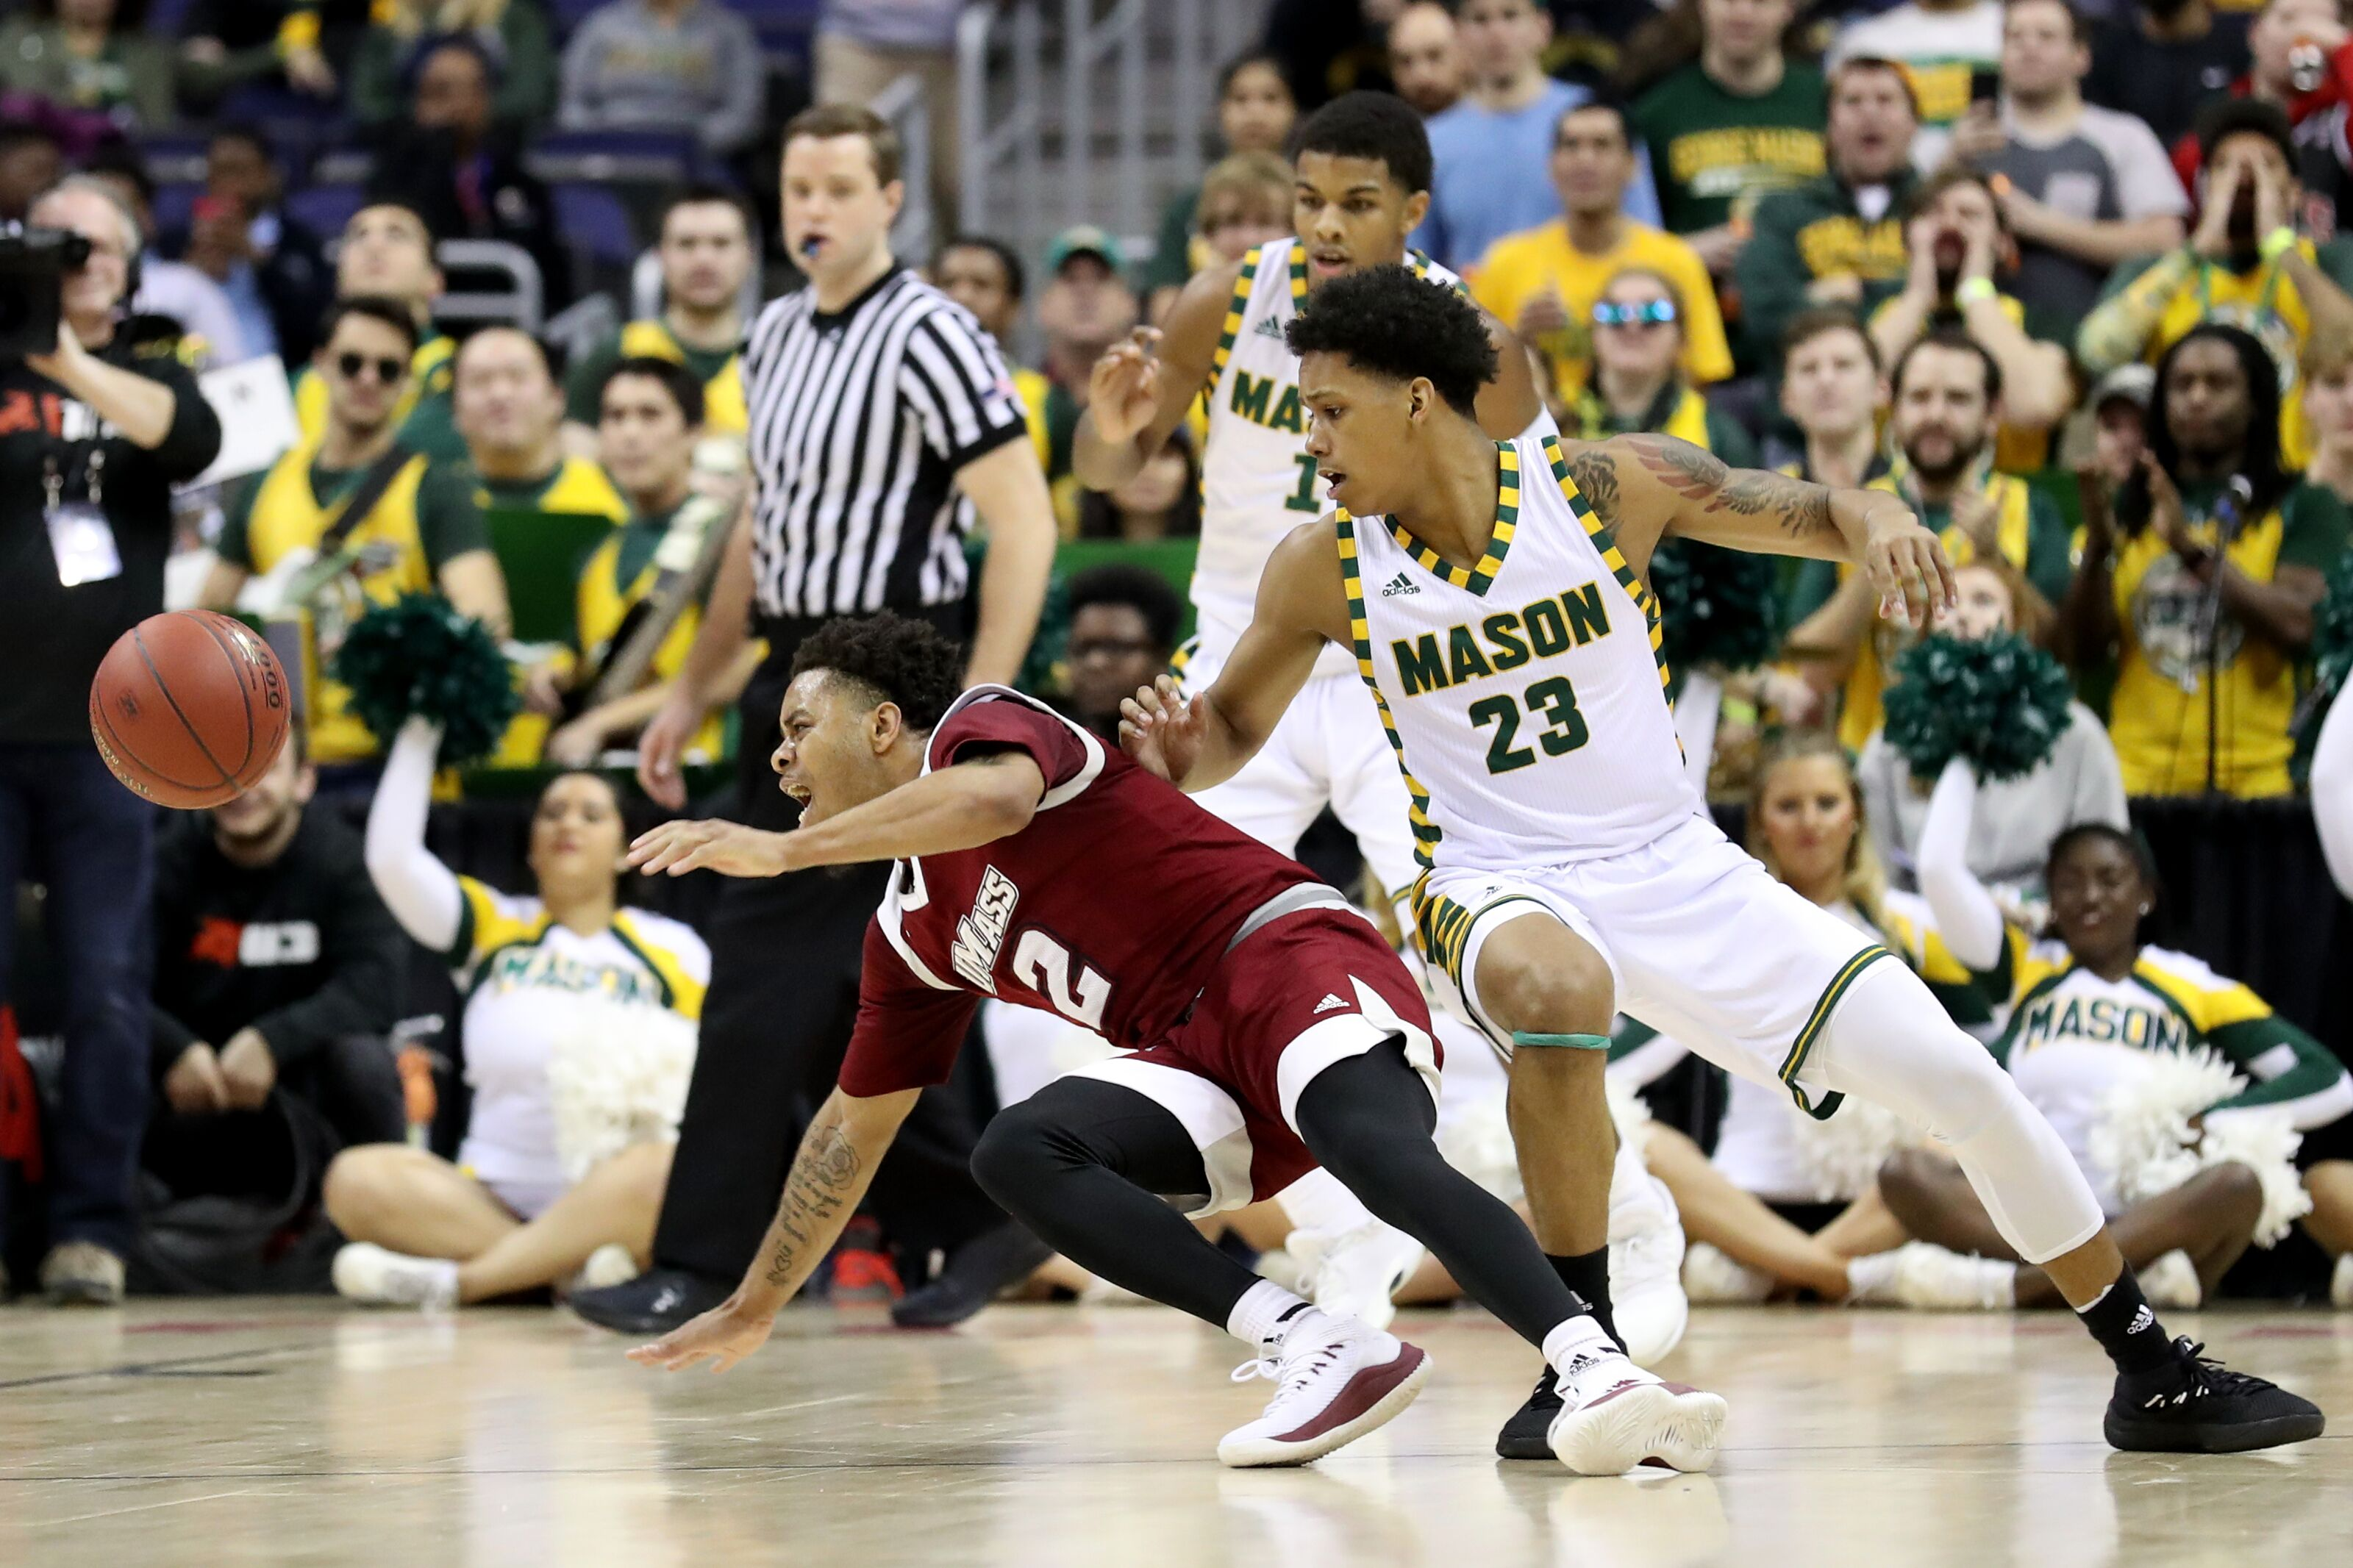 umass basketball: 2018-2019 season preview for the minutemen